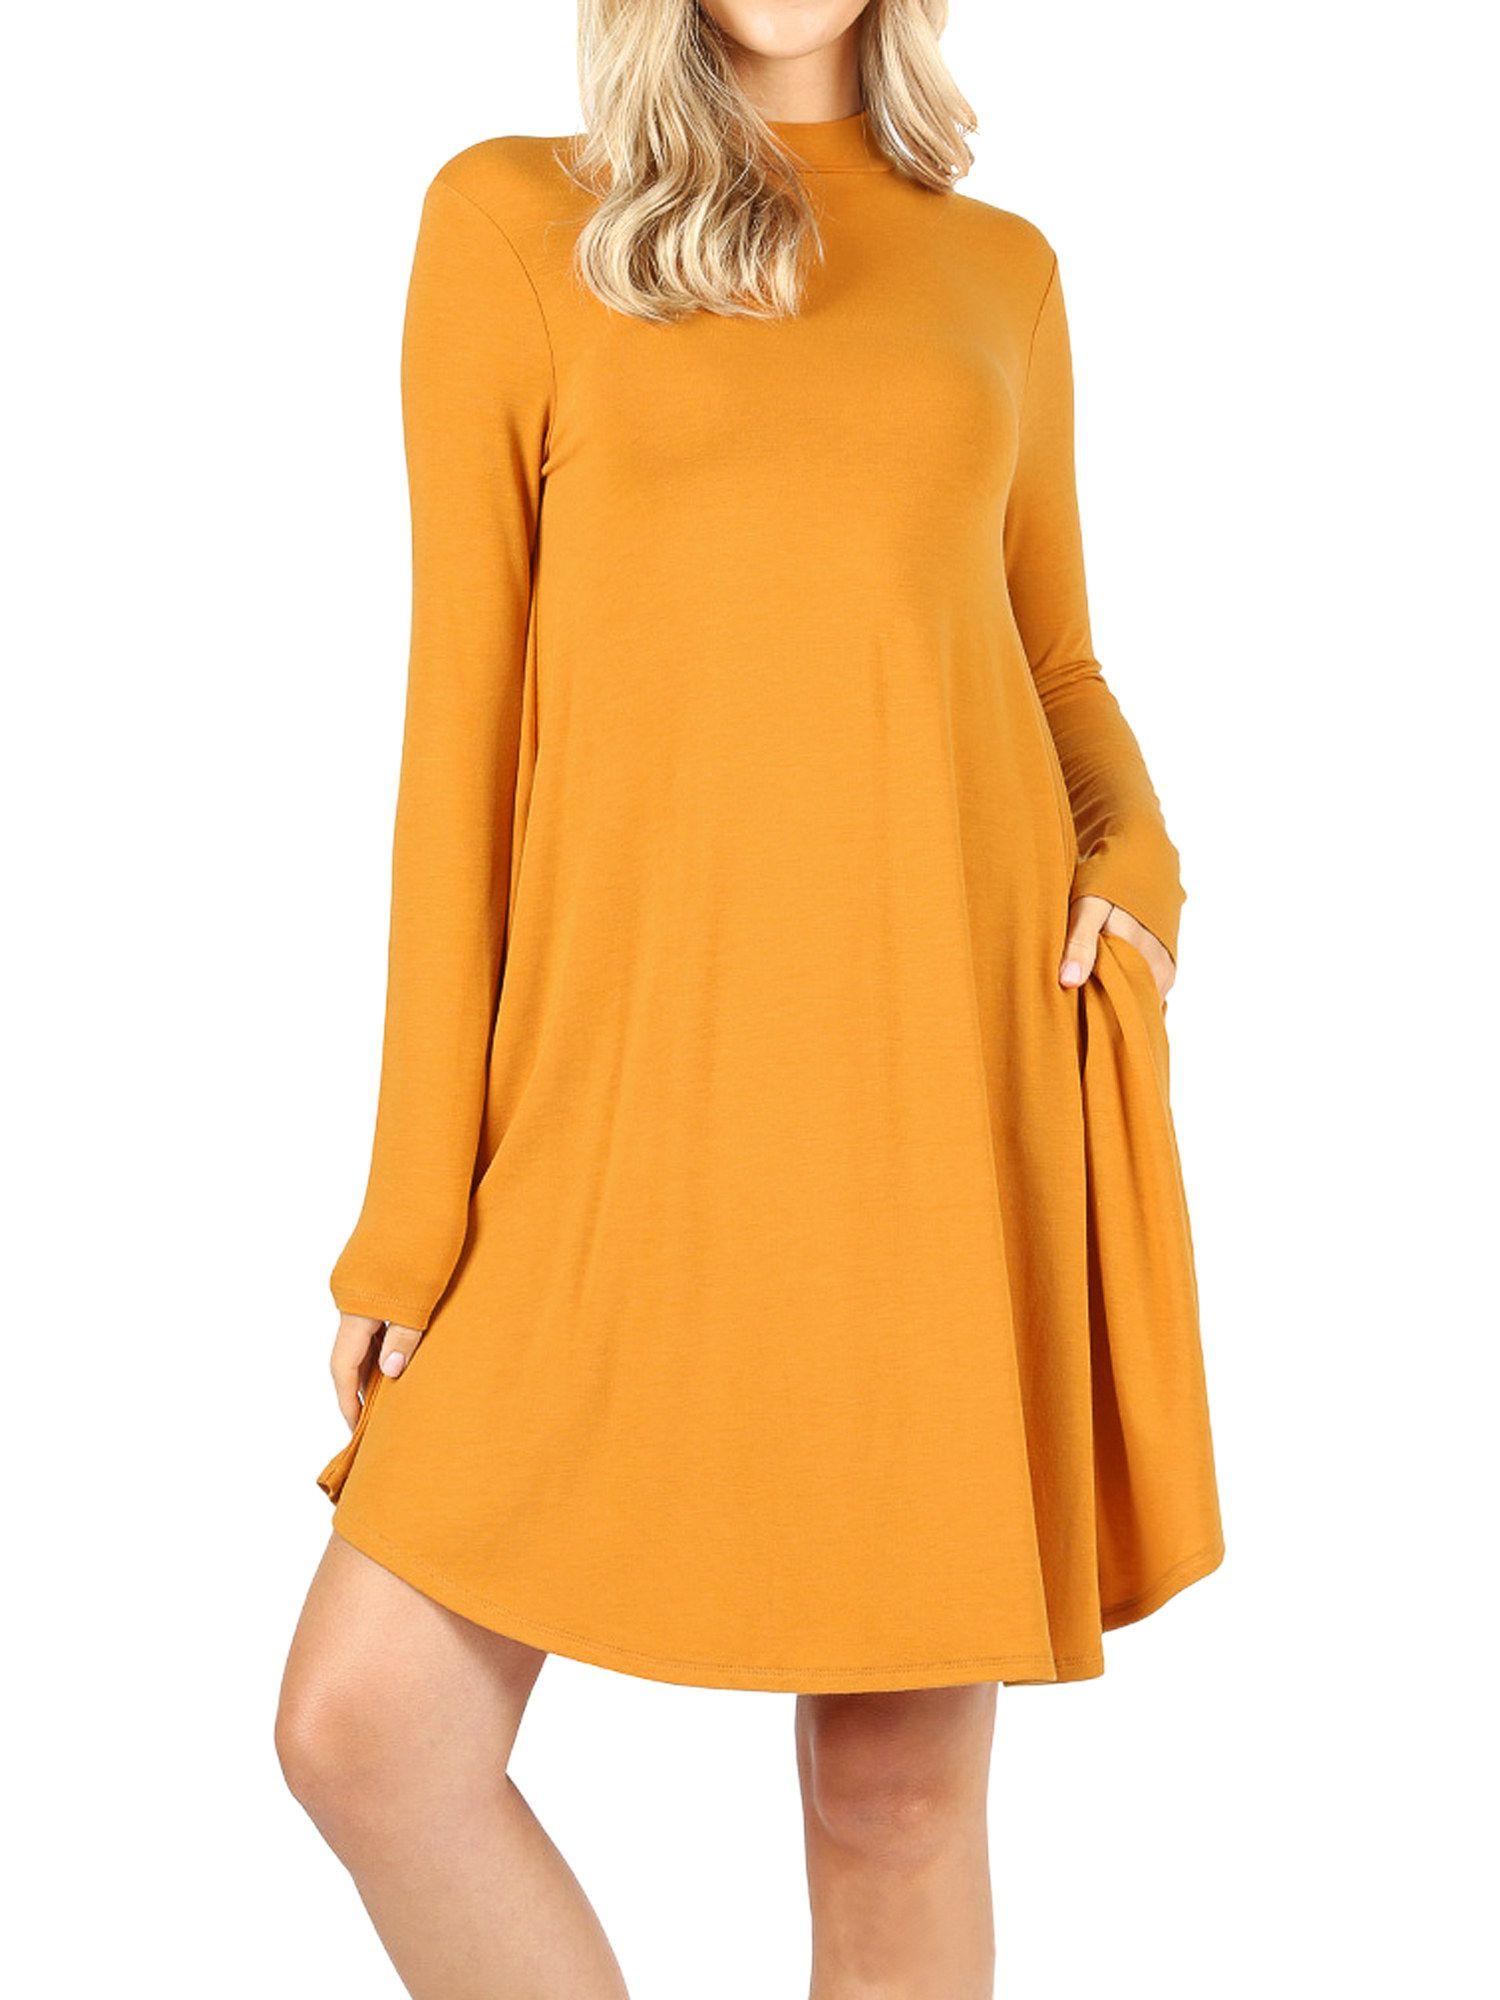 22 Dresses With Pockets You Can Get At Walmart Shift Dress Bold Dresses Dresses [ 2000 x 1500 Pixel ]